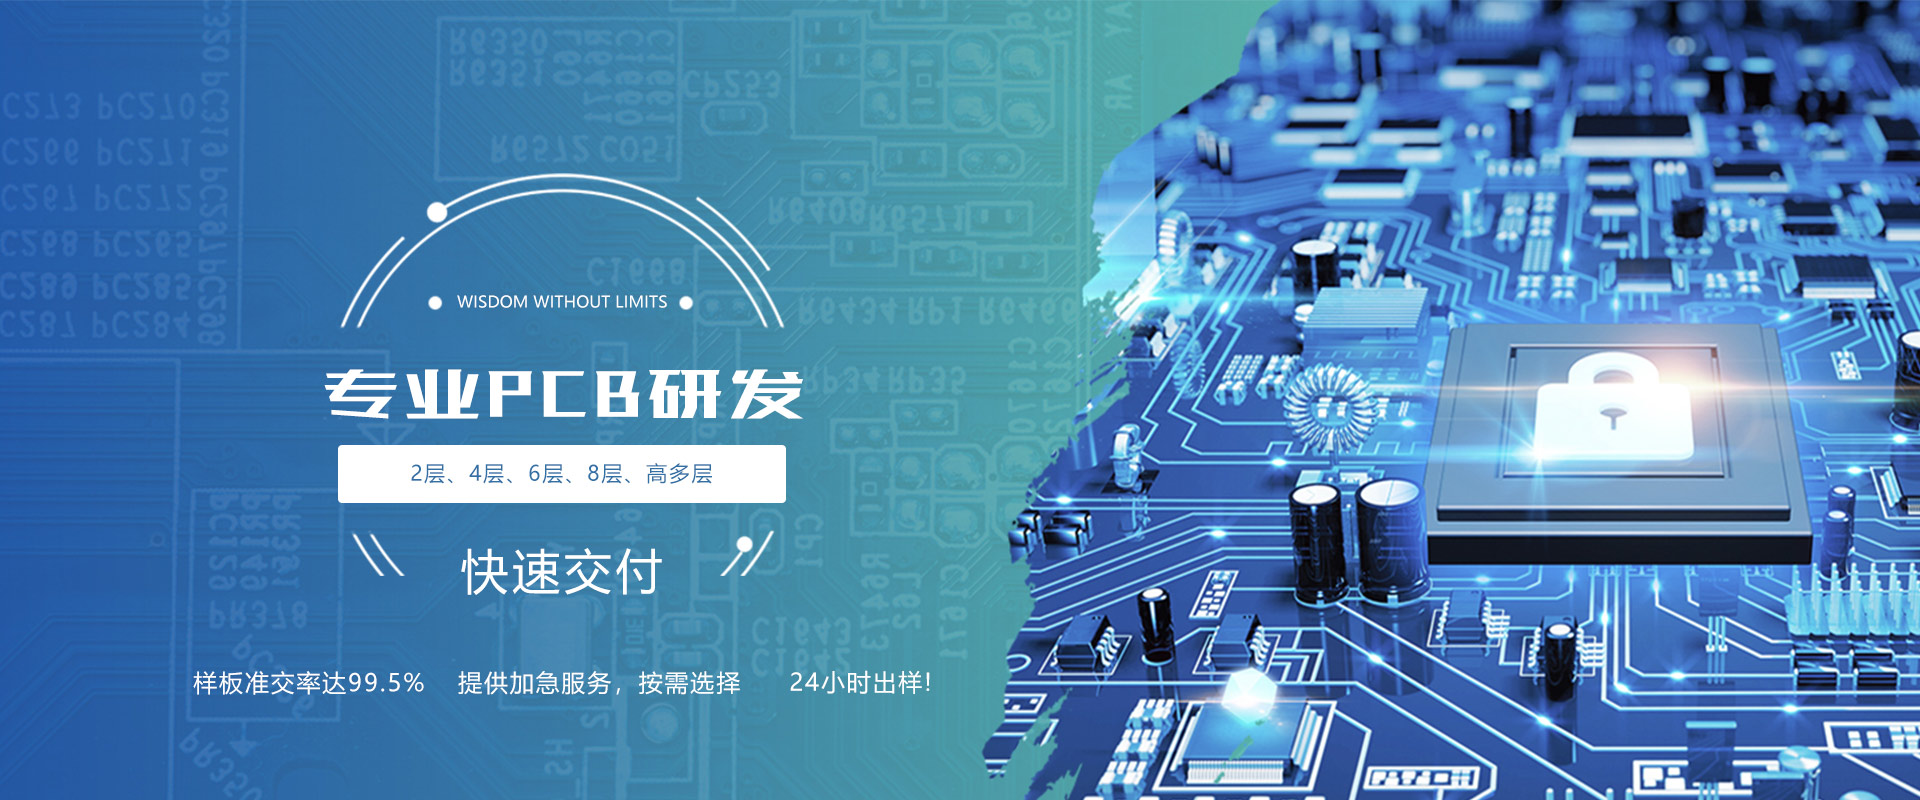 PCB电路板,PCB线路板,线路板厂家